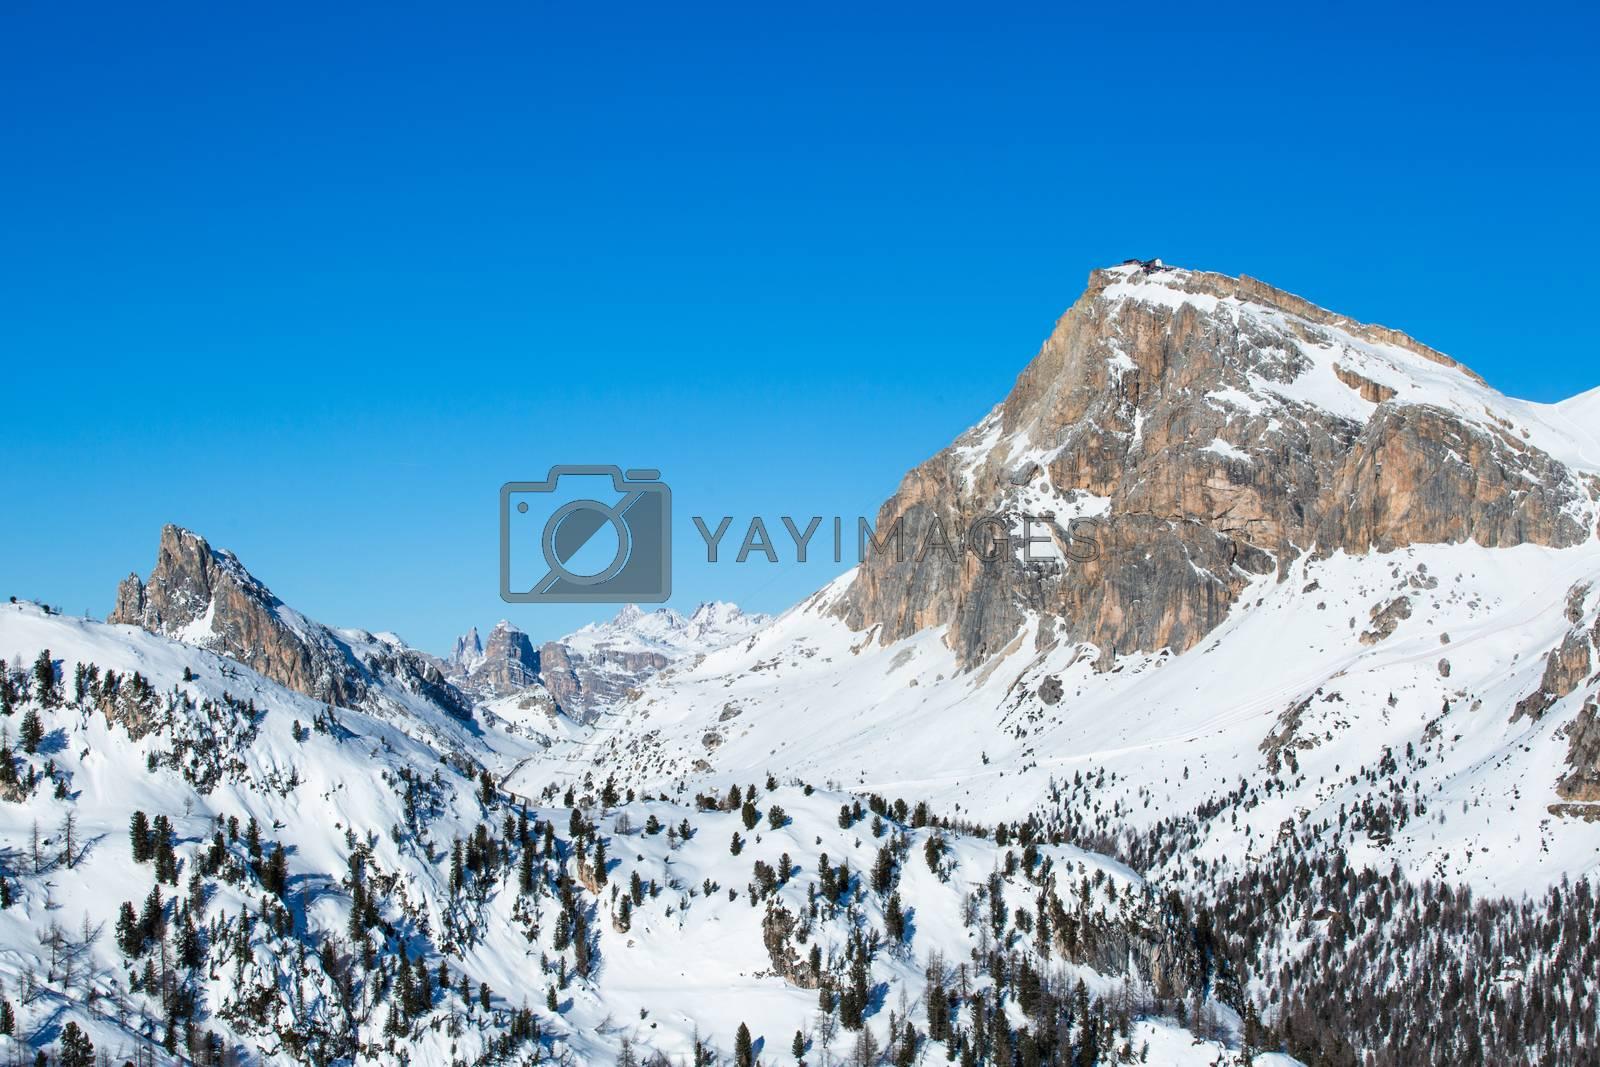 Dolomities Dolomiti Italy in wintertime beautiful alps winter mountains and ski slope Cortina d'Ampezzo Col Gallina mountain peaks famous landscape skiing resort area